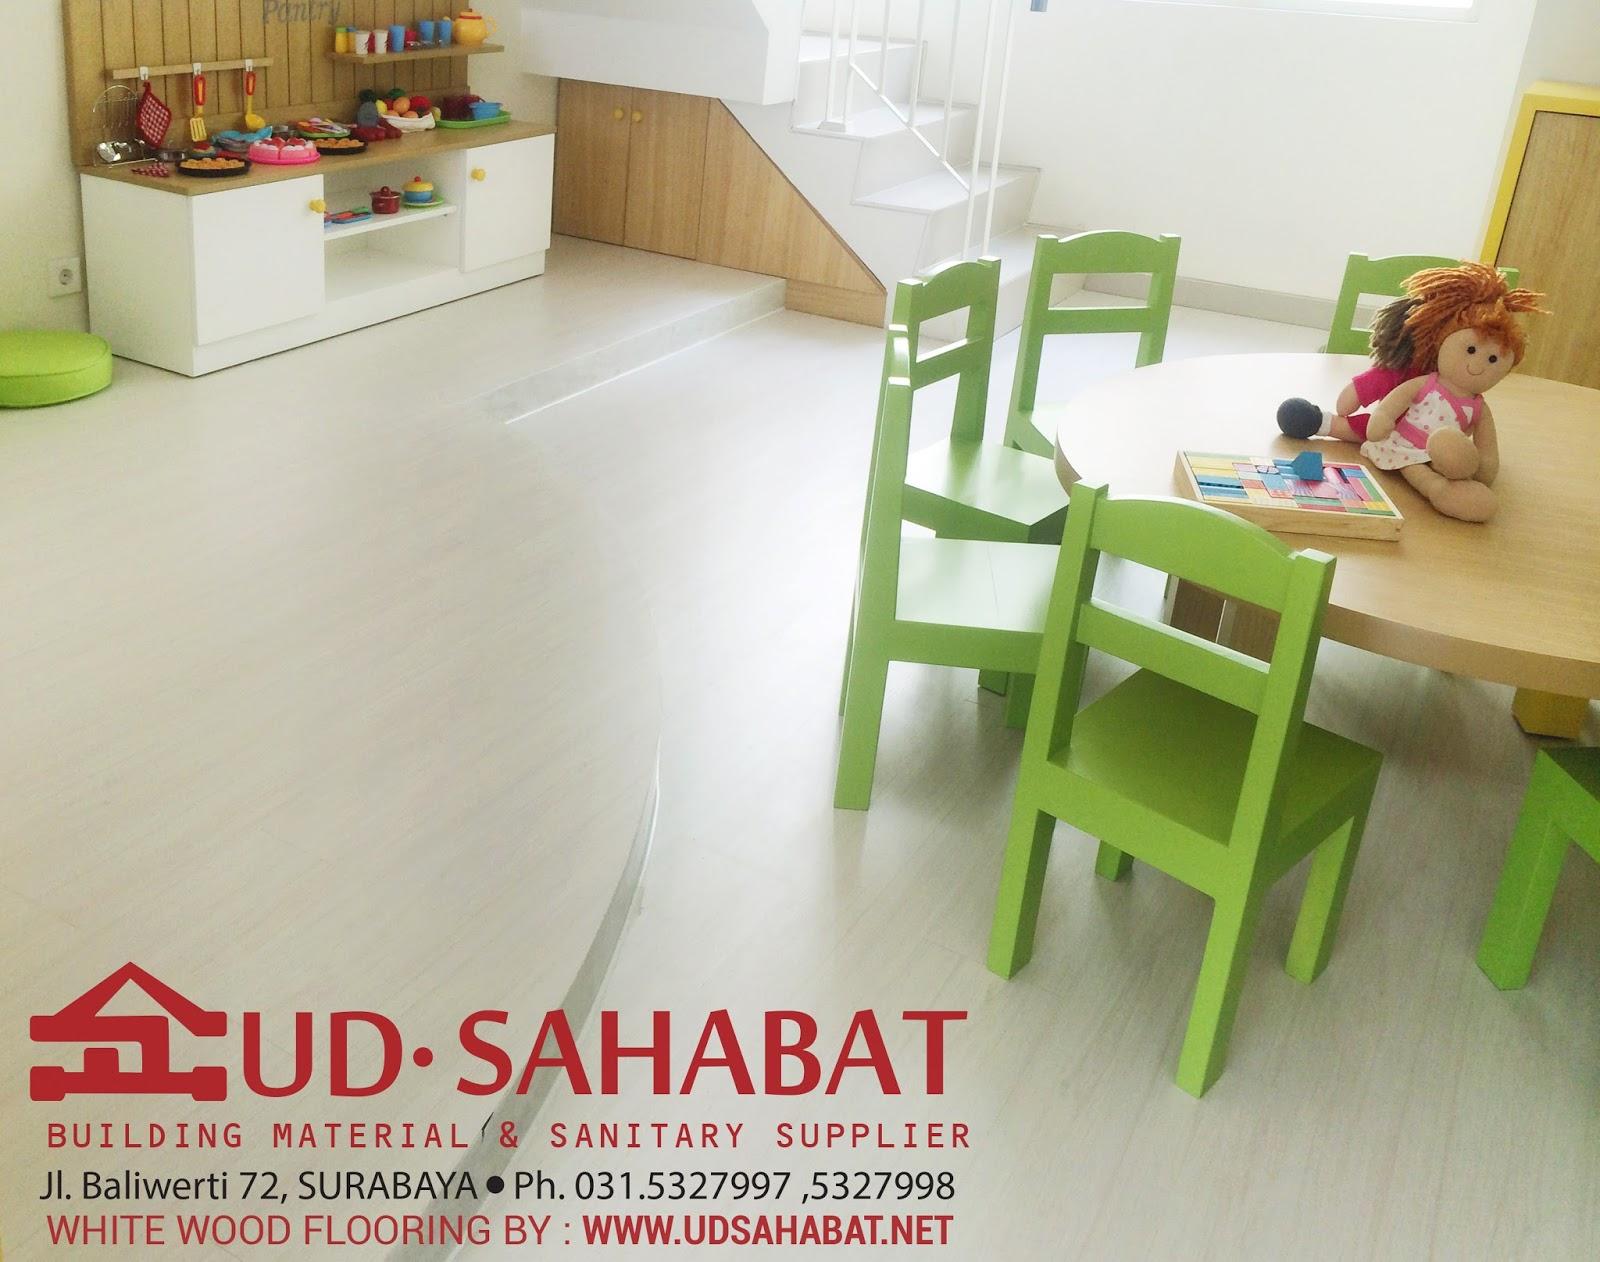 jual wood flooring lantai vinil kayu putih ud sahabat surabaya